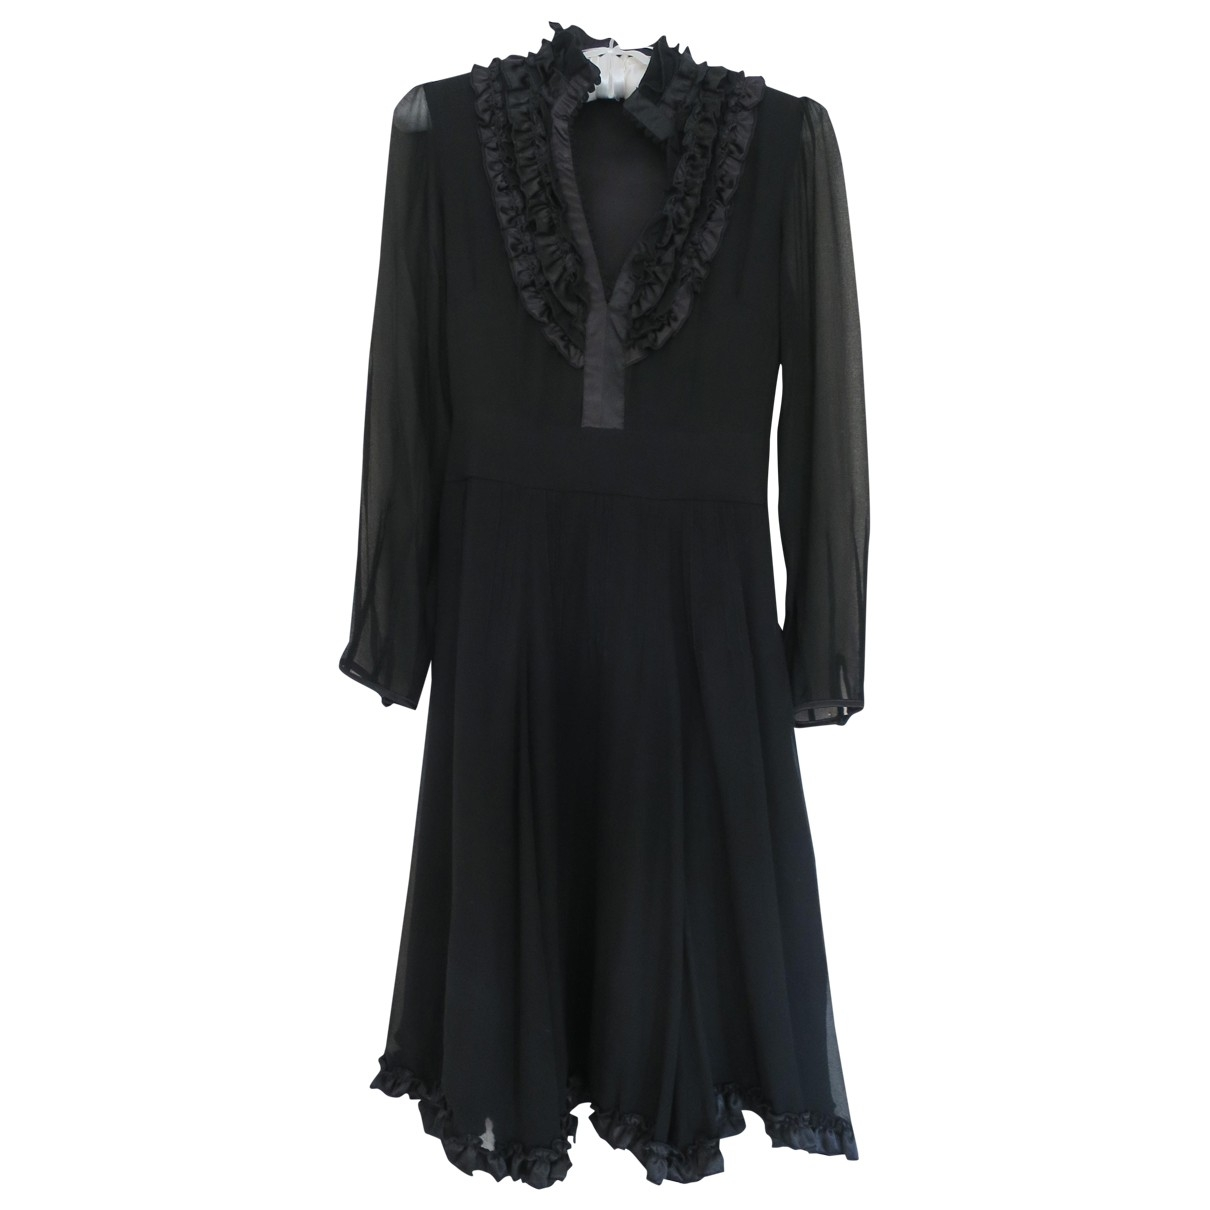 Chloé \N Black Silk dress for Women 8 UK